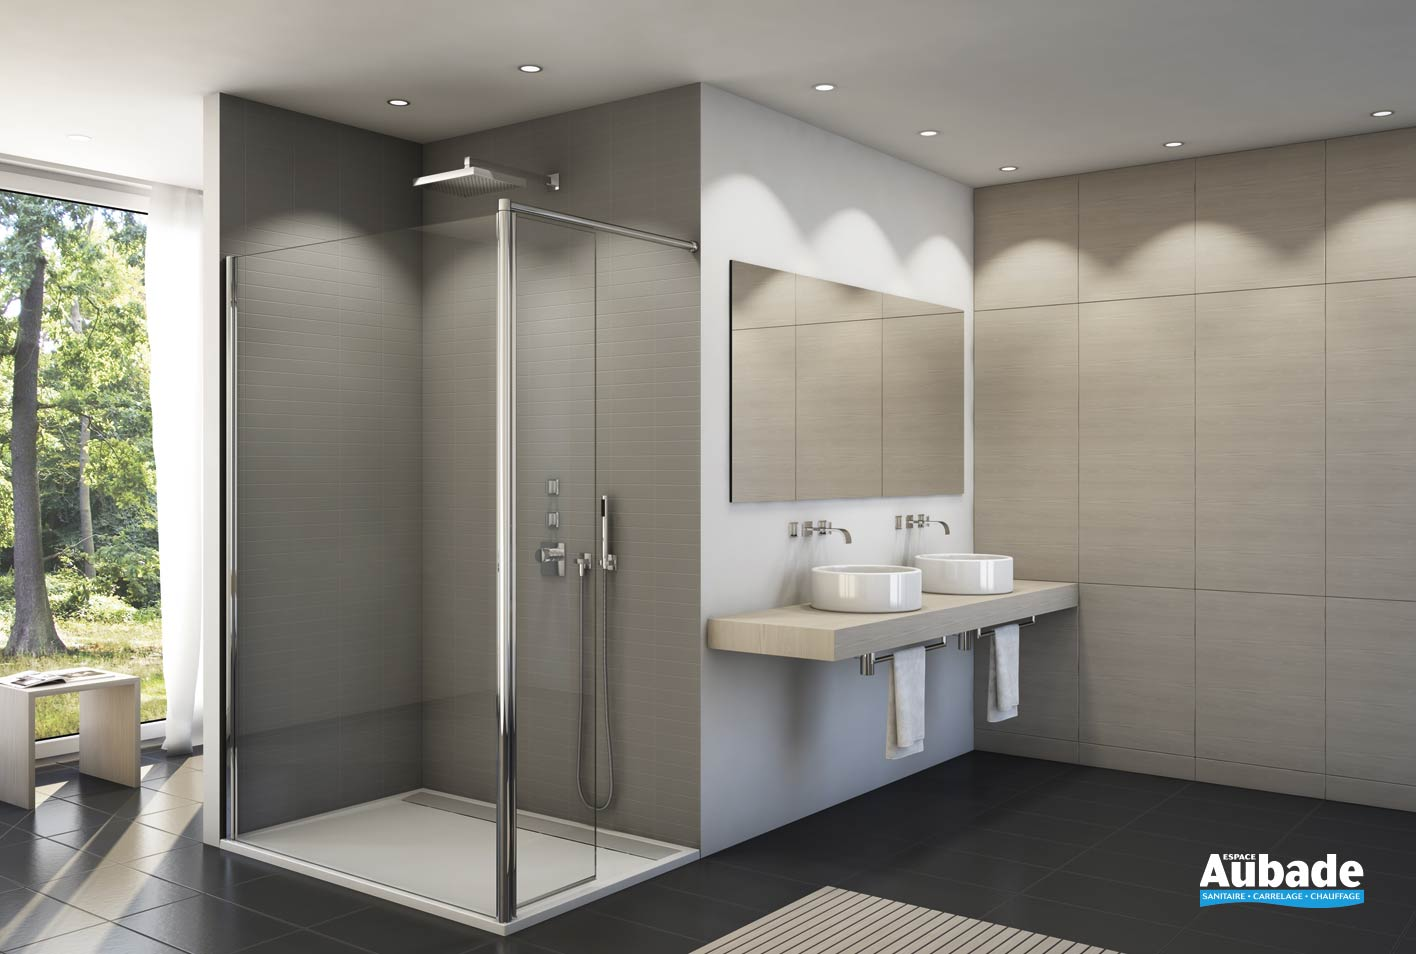 paroi de douche design sanswiss fun espace aubade. Black Bedroom Furniture Sets. Home Design Ideas